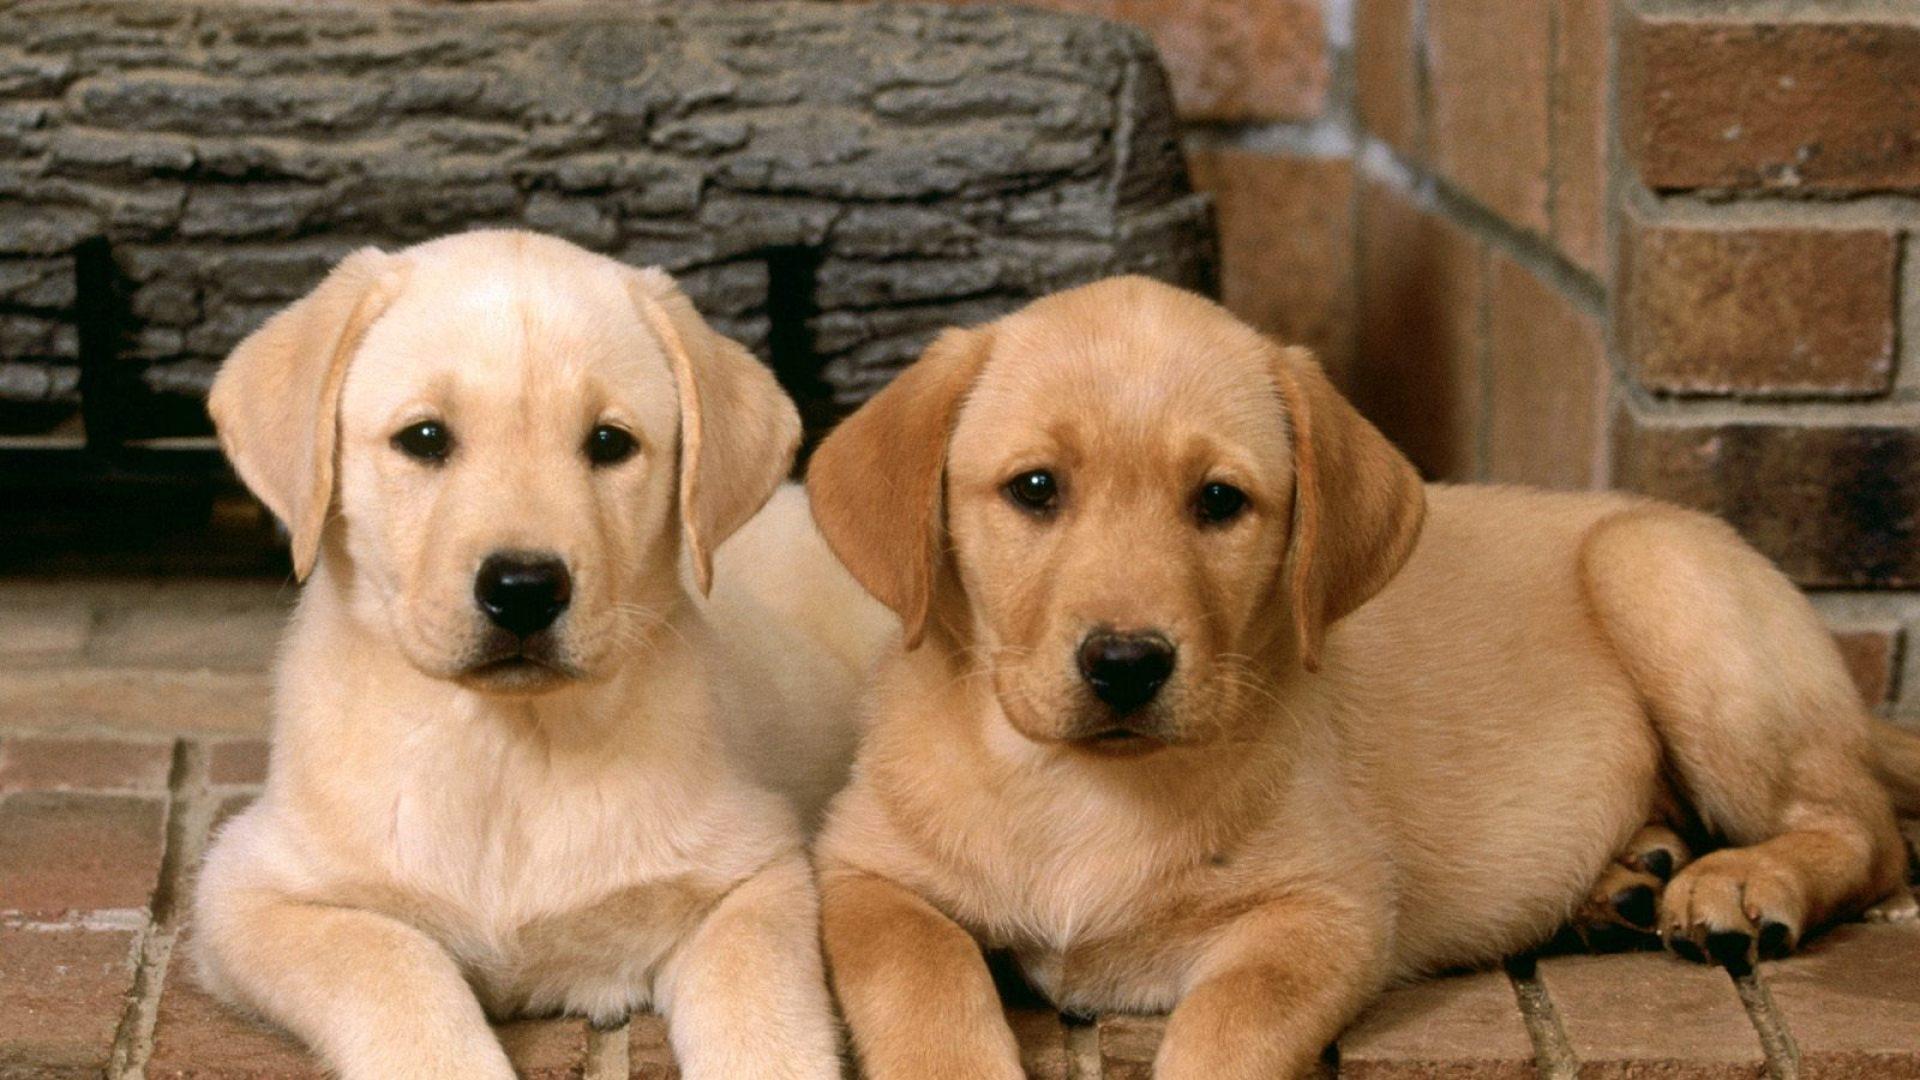 Cachorros de perros labradores 1920x1080 fondos de for Fondos de pantalla de perritos